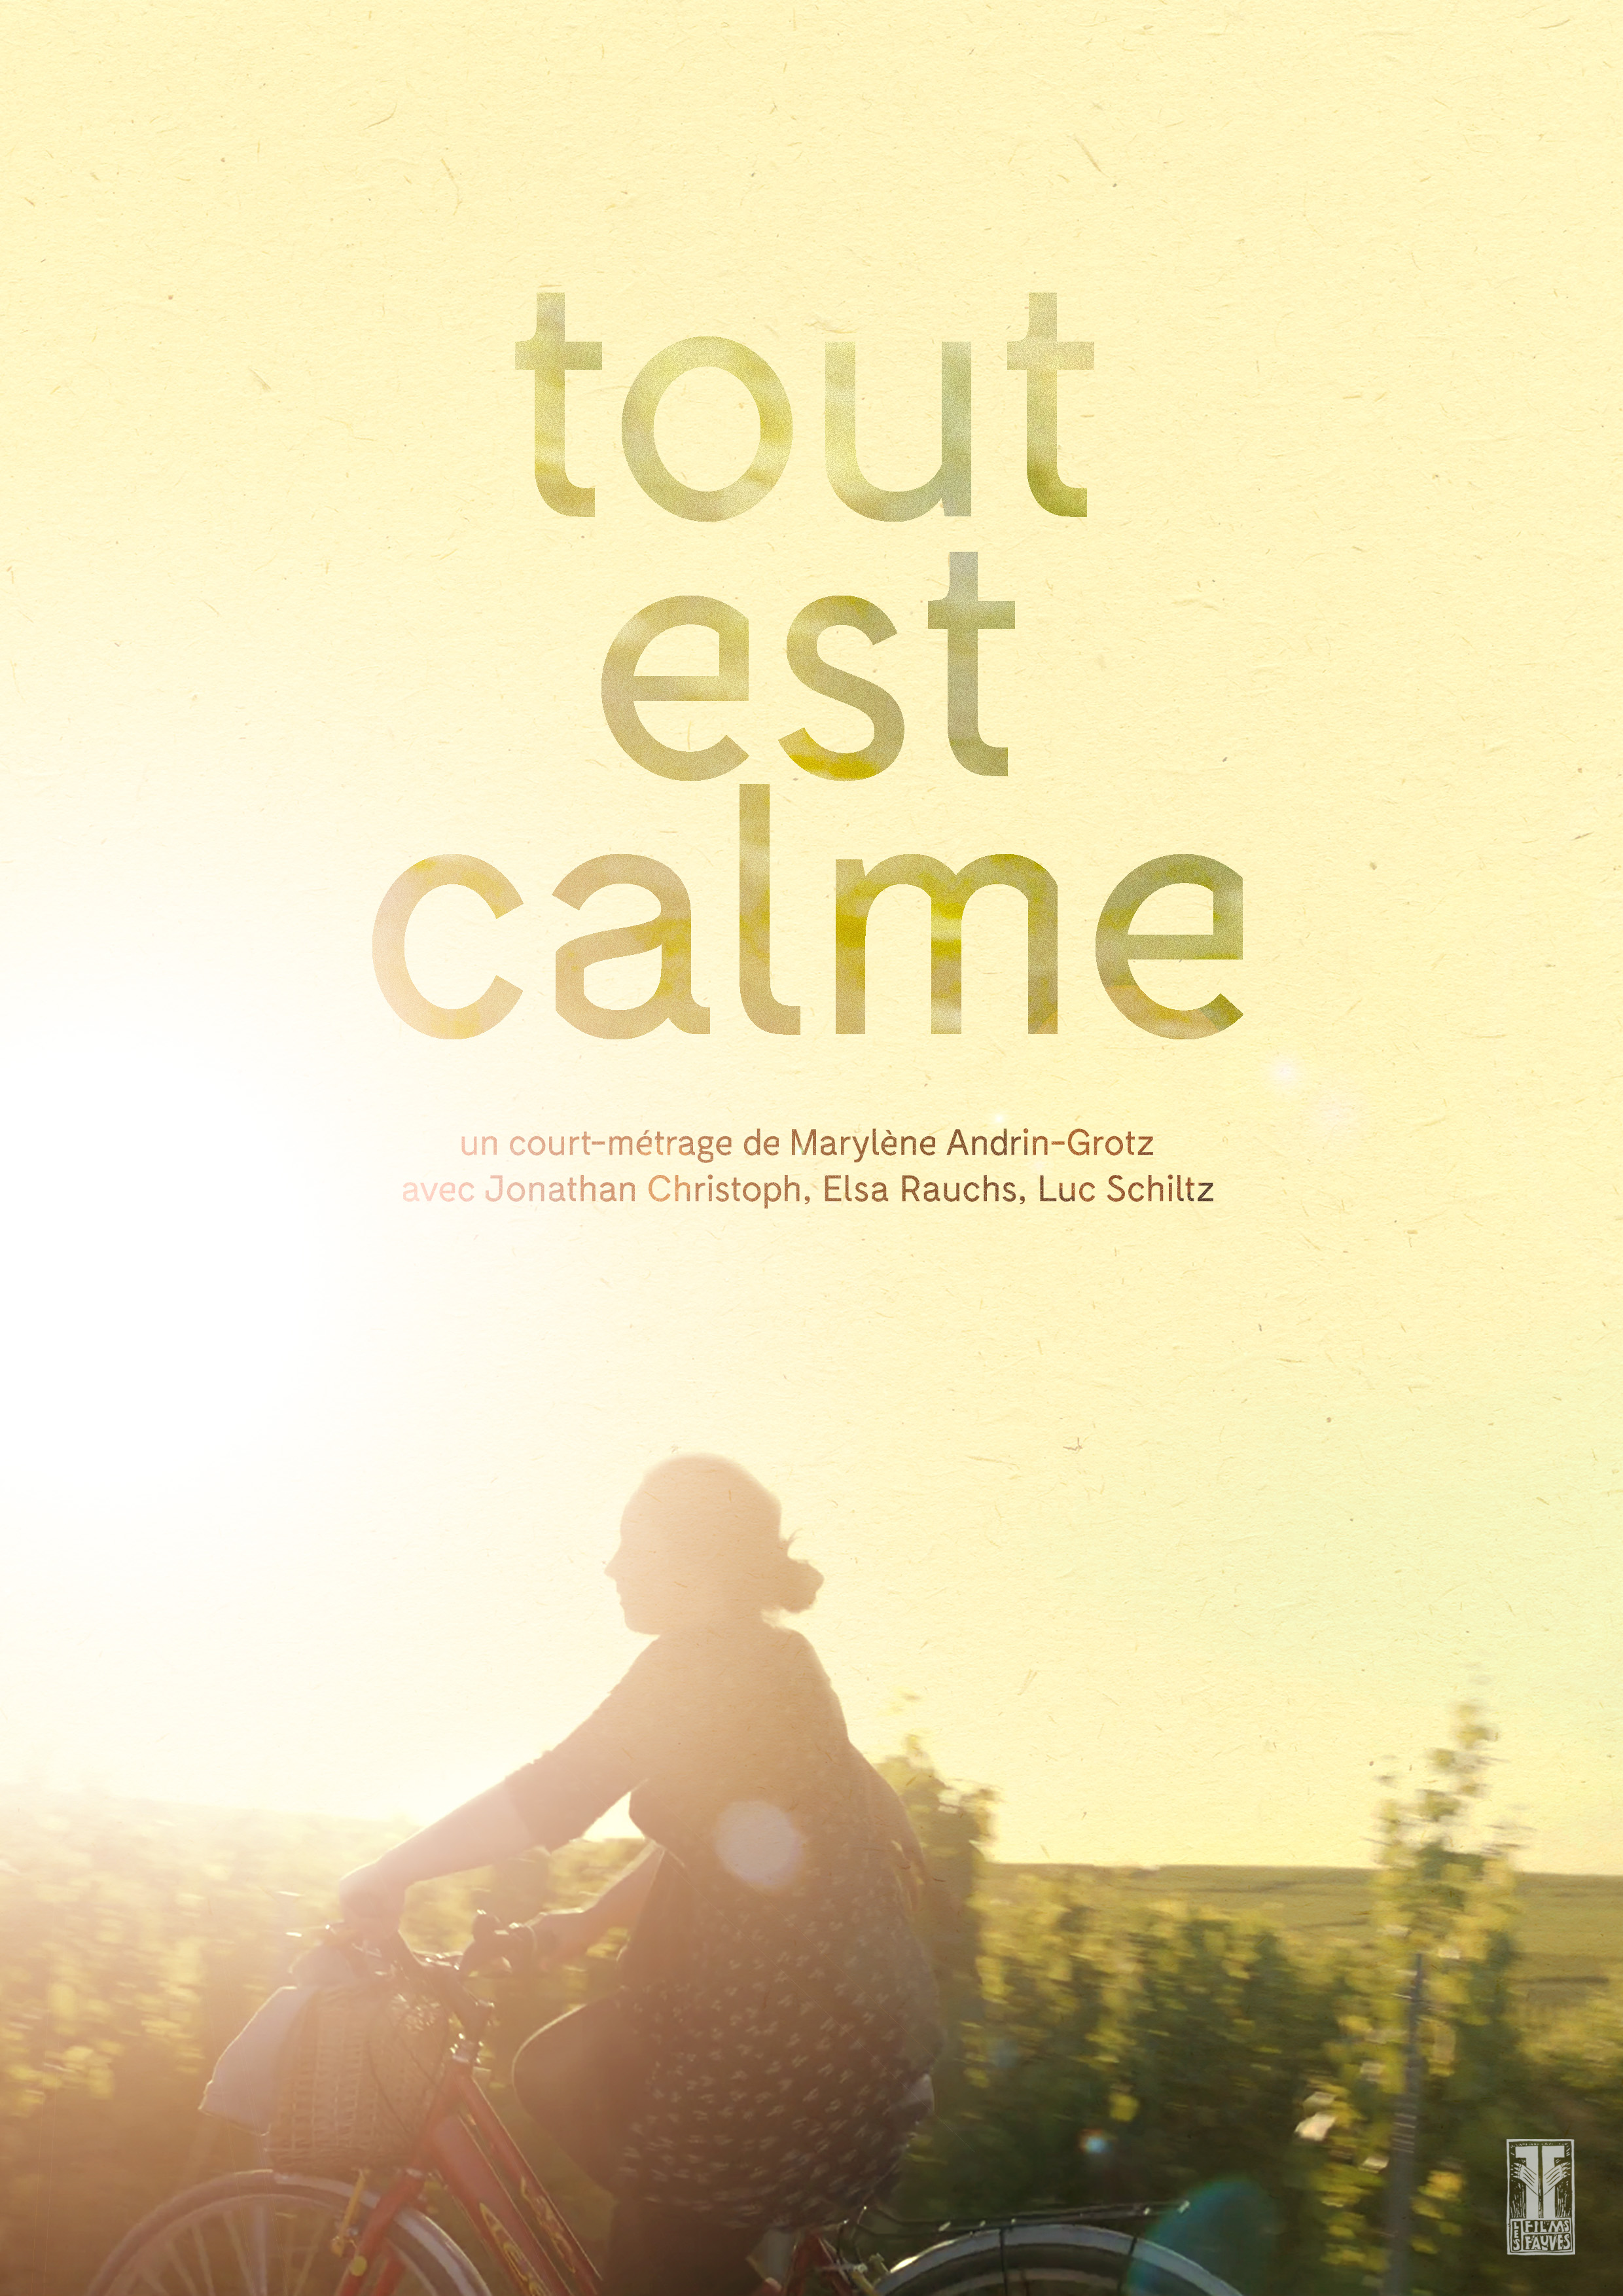 TOUT EST CALME /ALL IS CALM - Directed by Marylène ANDRIN-GROTZScript by Marylène ANDRIN-GROTZWith Jonathan CHRISTOPH, Elsa RAUCHS & Luc SCHILTZYear:2016Original Version:FrenchGenre:Drama, SocialRunning Time:19minProduction companies:LES FILMS FAUVES (LU)